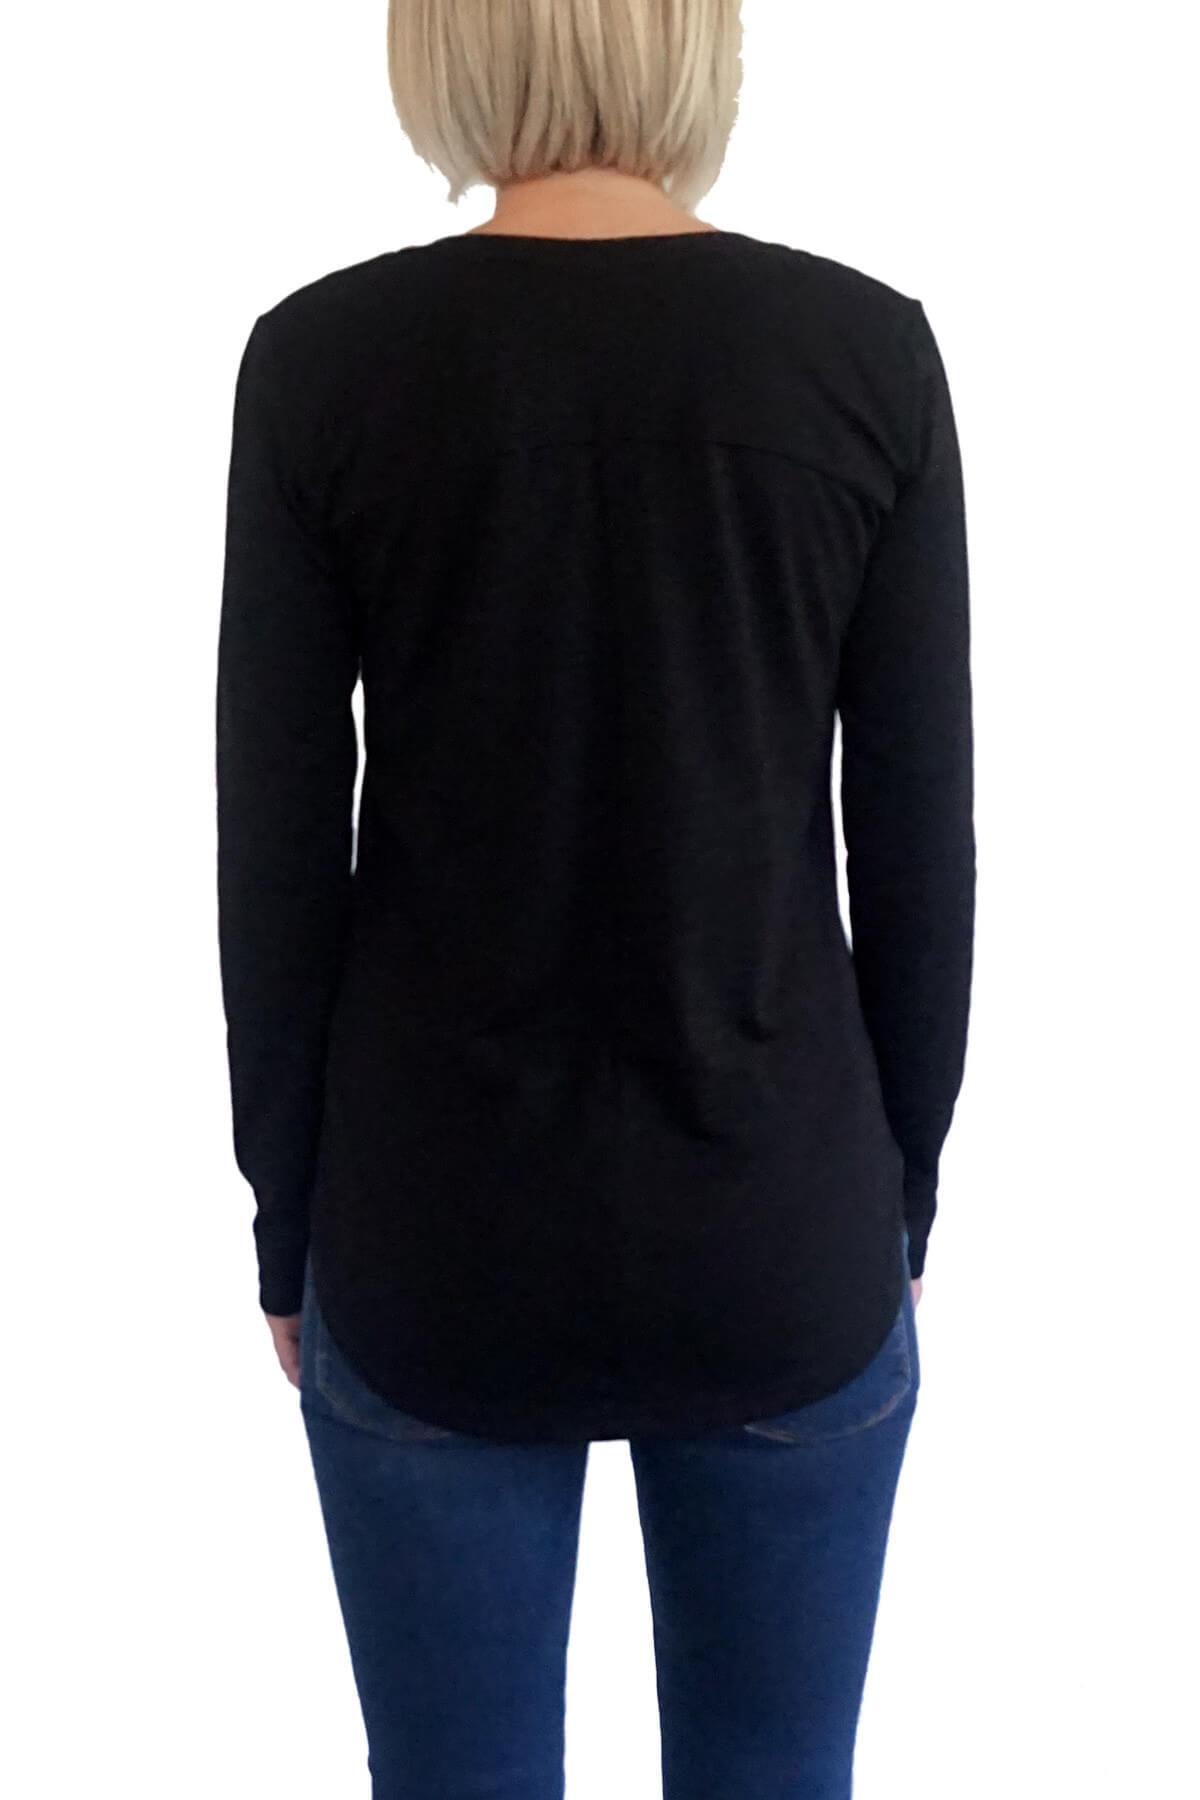 MOF Kadın Siyah T-Shirt VYVKT-S 2